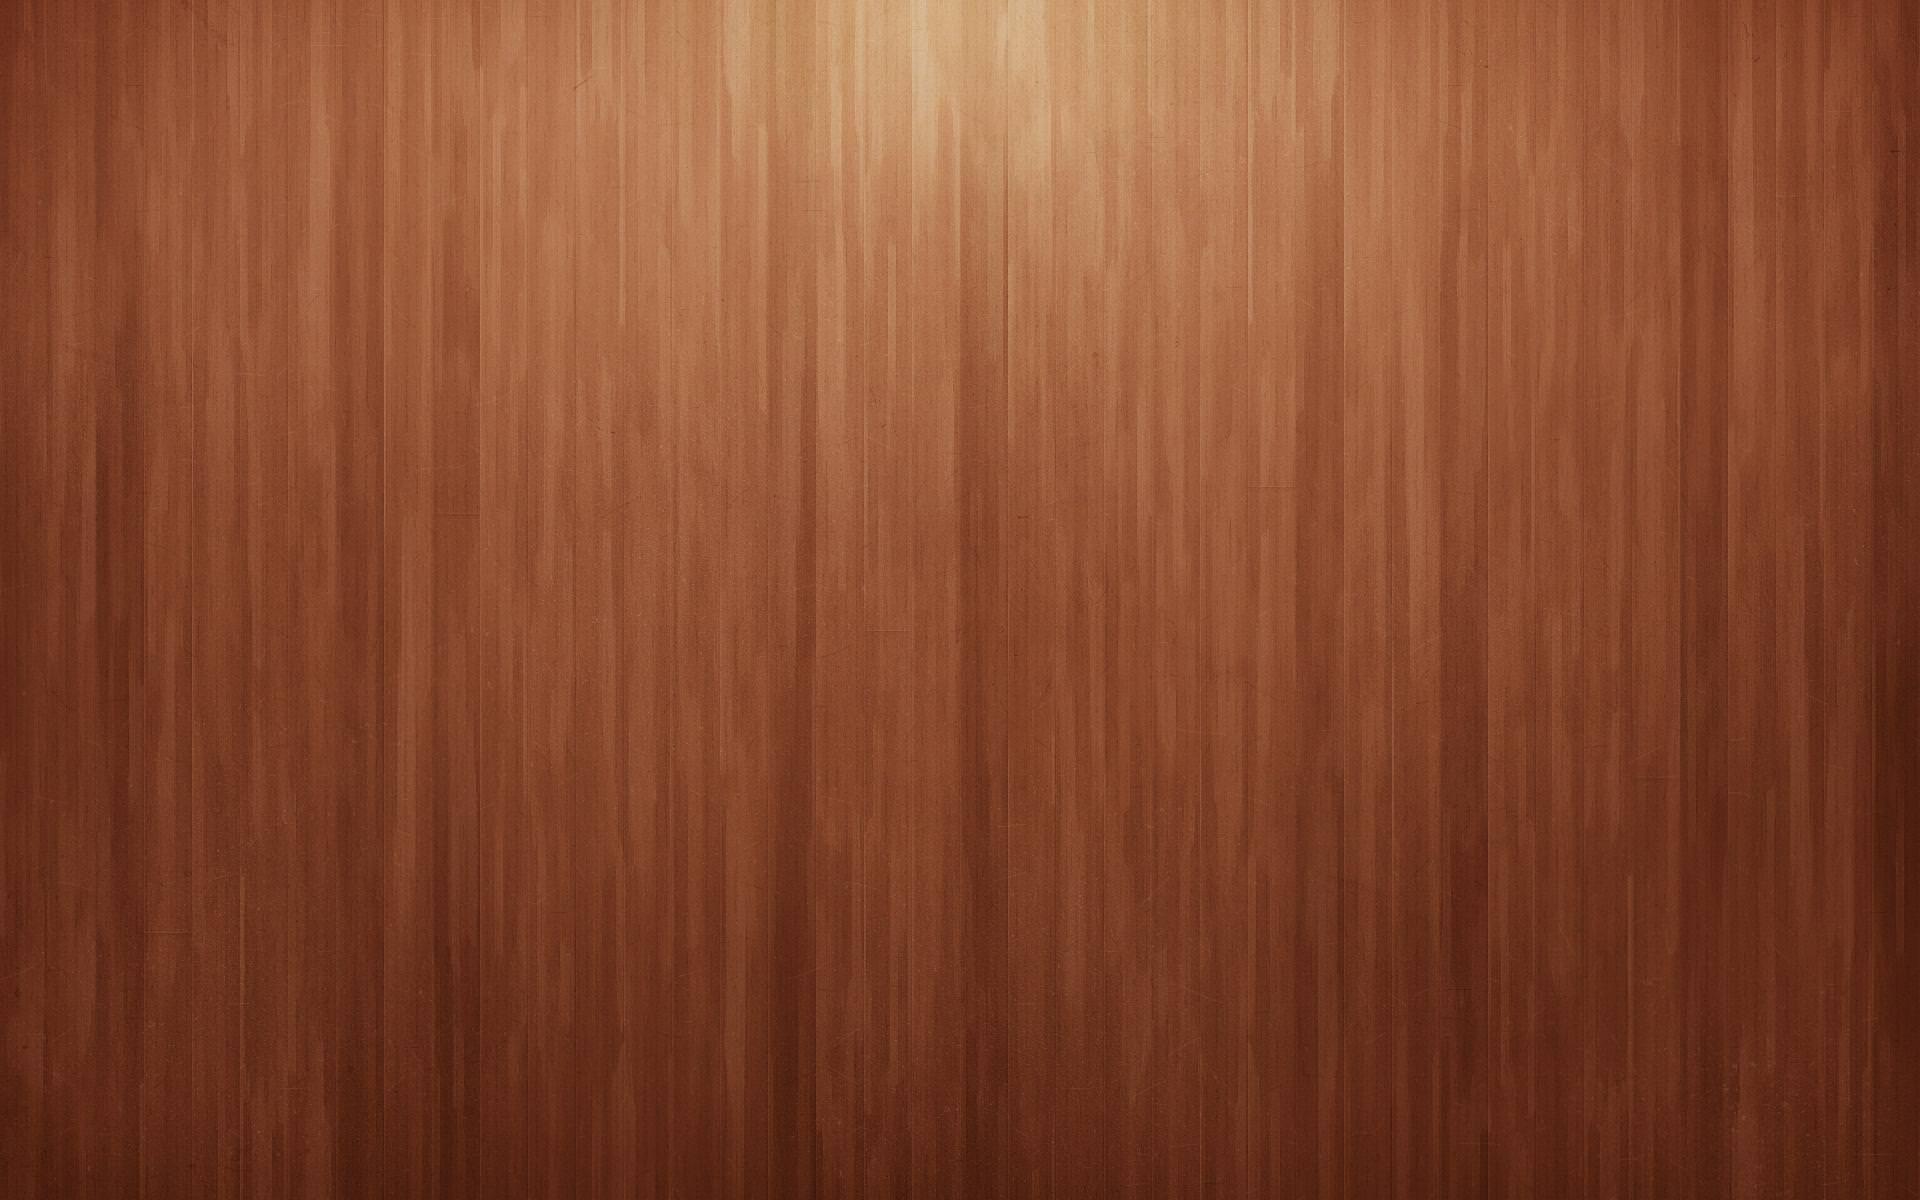 30+ HD Wood Backgrounds